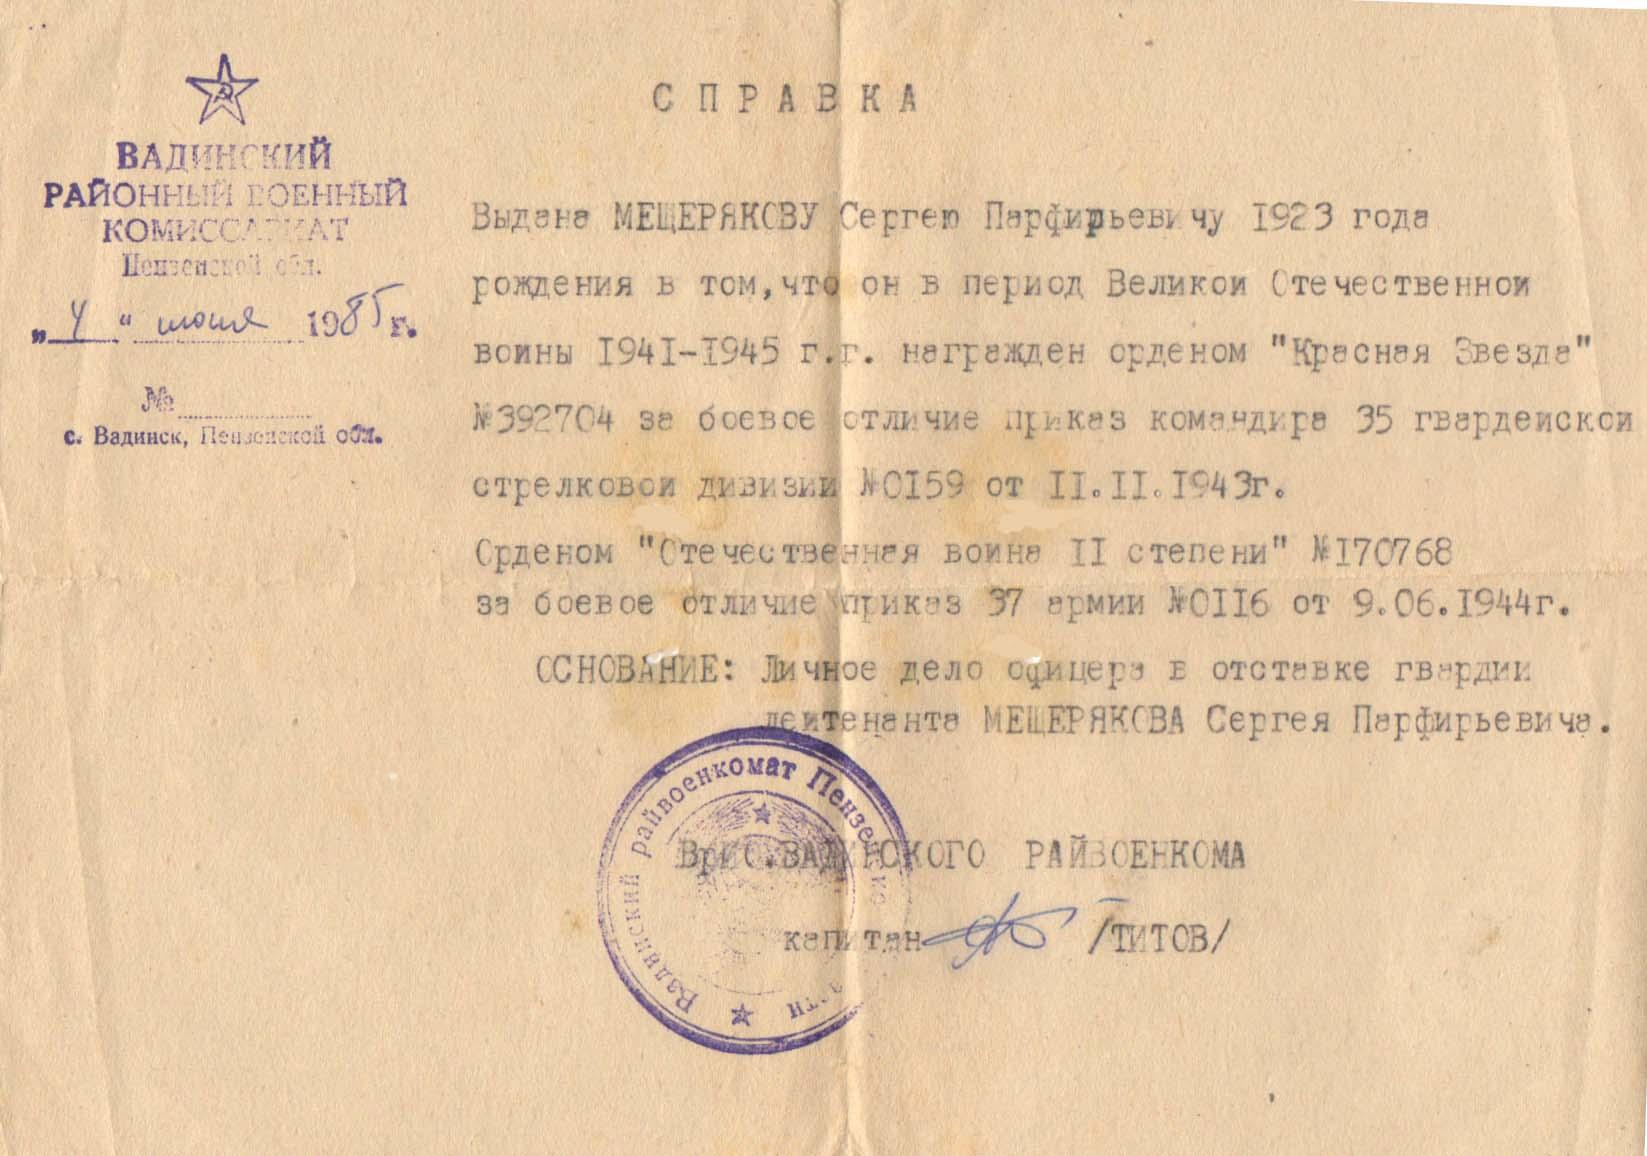 http://www.vestivad.ru/images/news/news_text_1966_9065_spraka.jpg